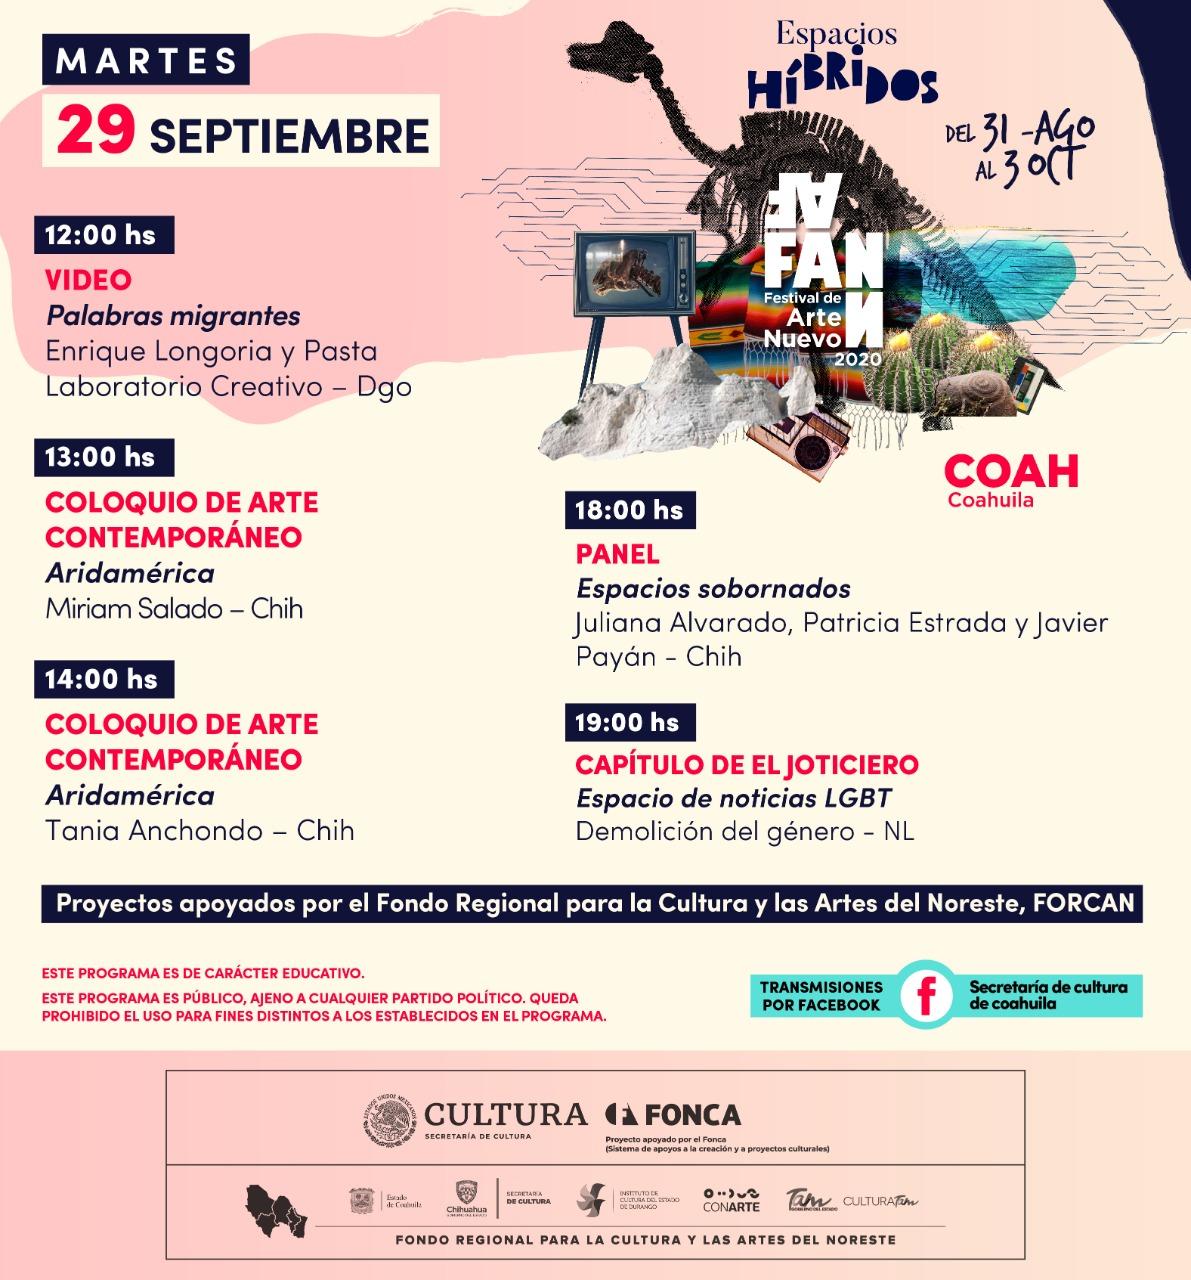 Festival de Arte Nuevo 2020